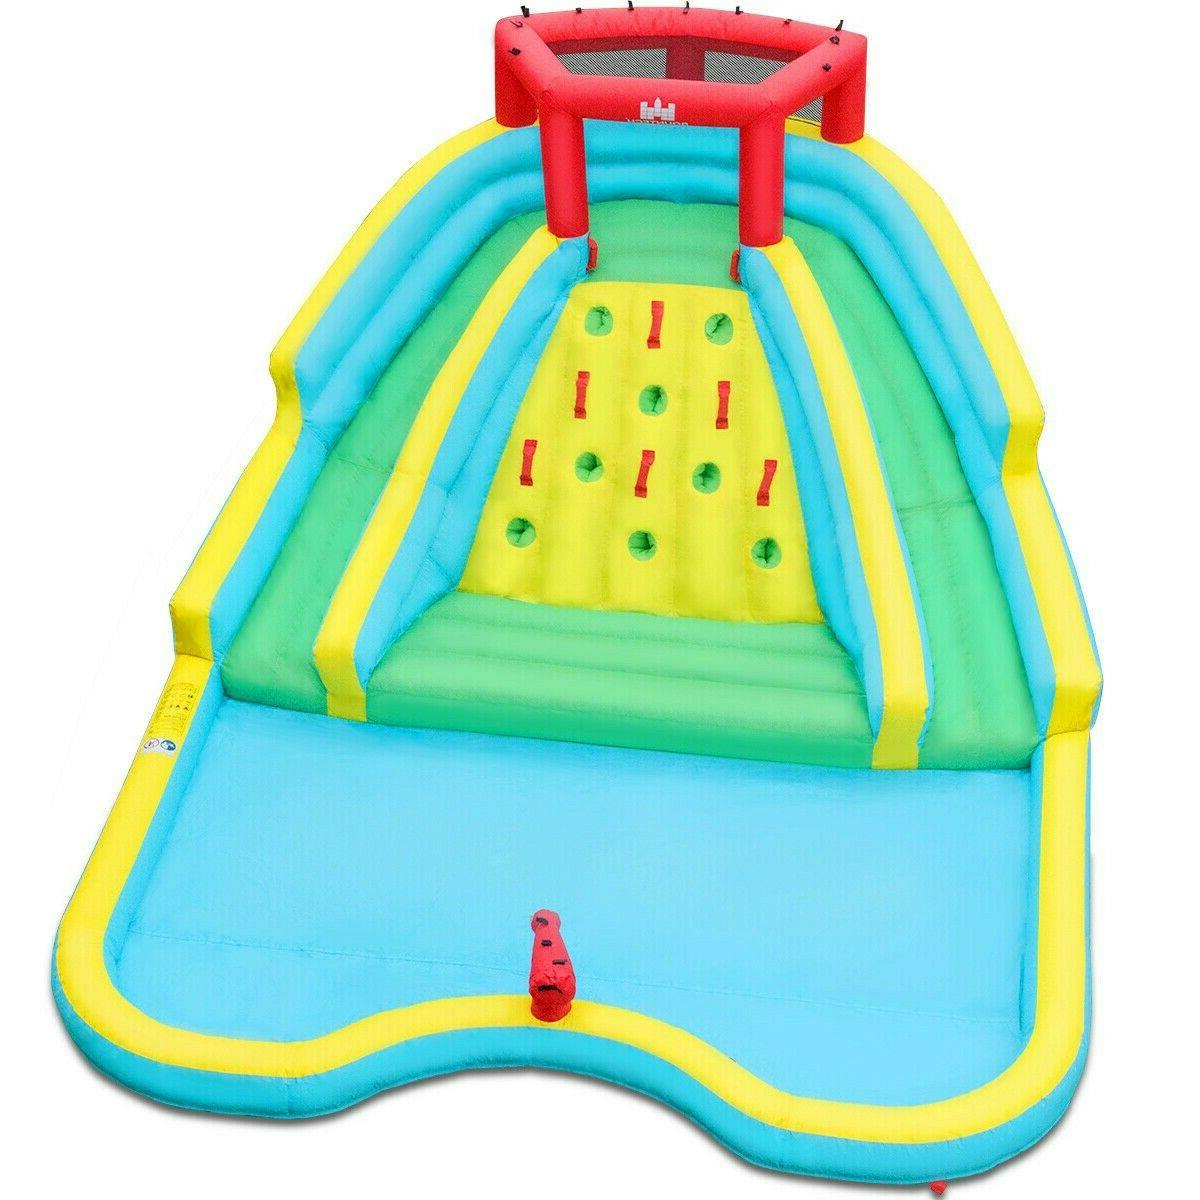 Inflatable Water Park Splash Adventure Water Slide Bouncer W